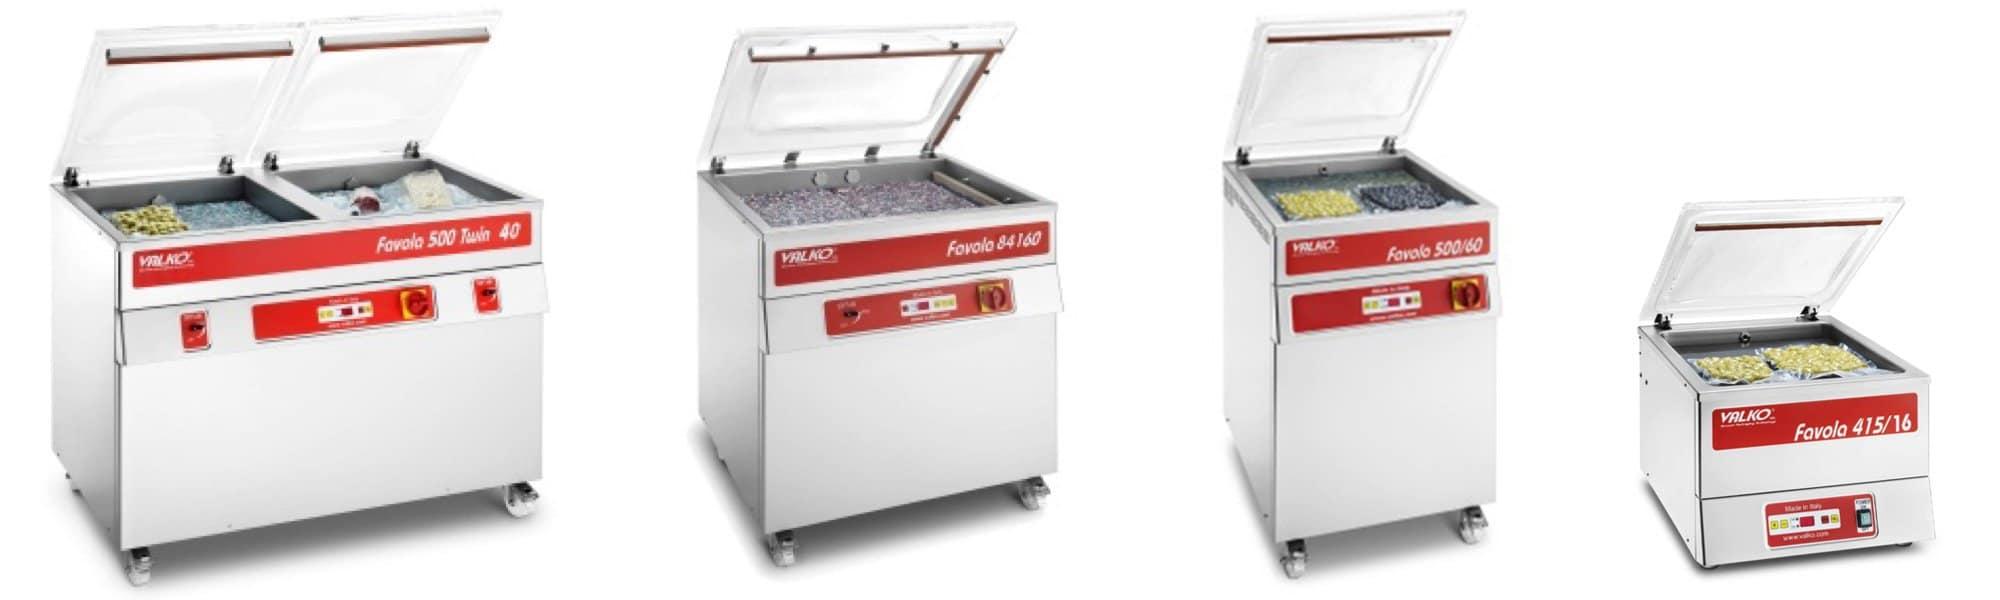 Chamber vacuum packaging machines for Pasta